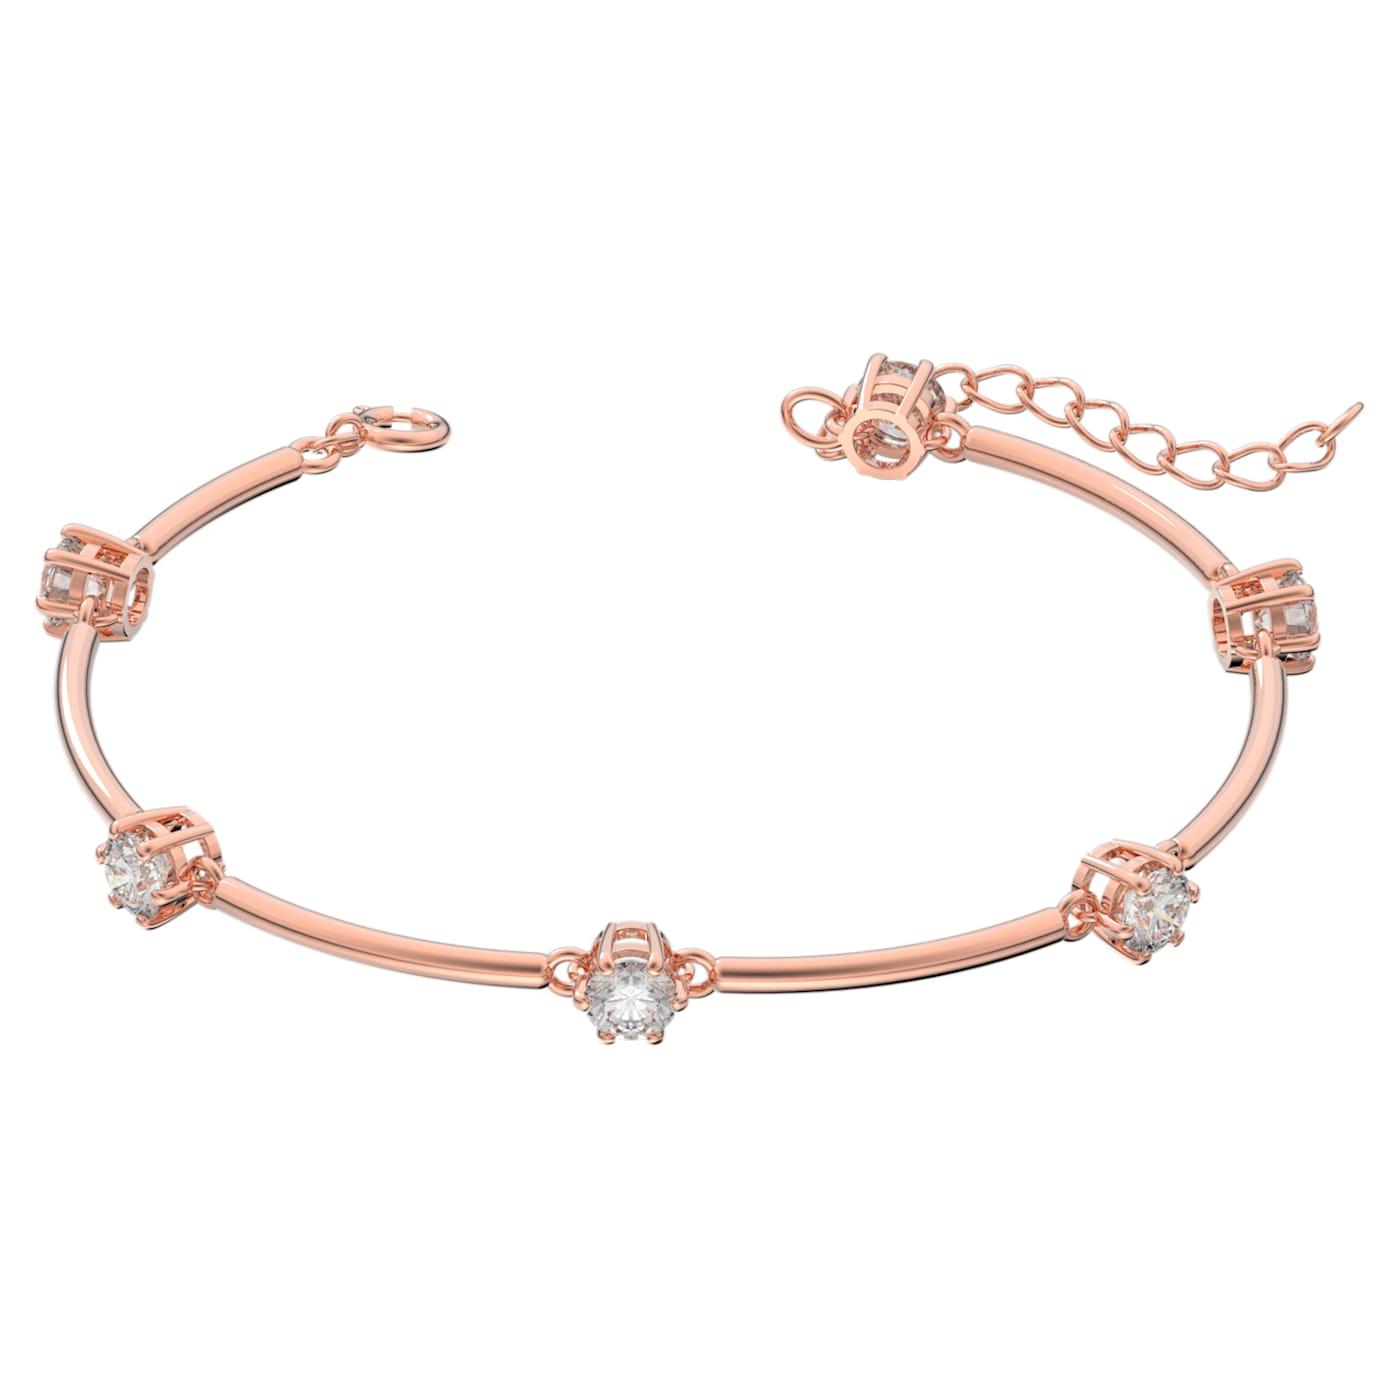 Bracelet-jonc Constella Blanc, Métal doré rose